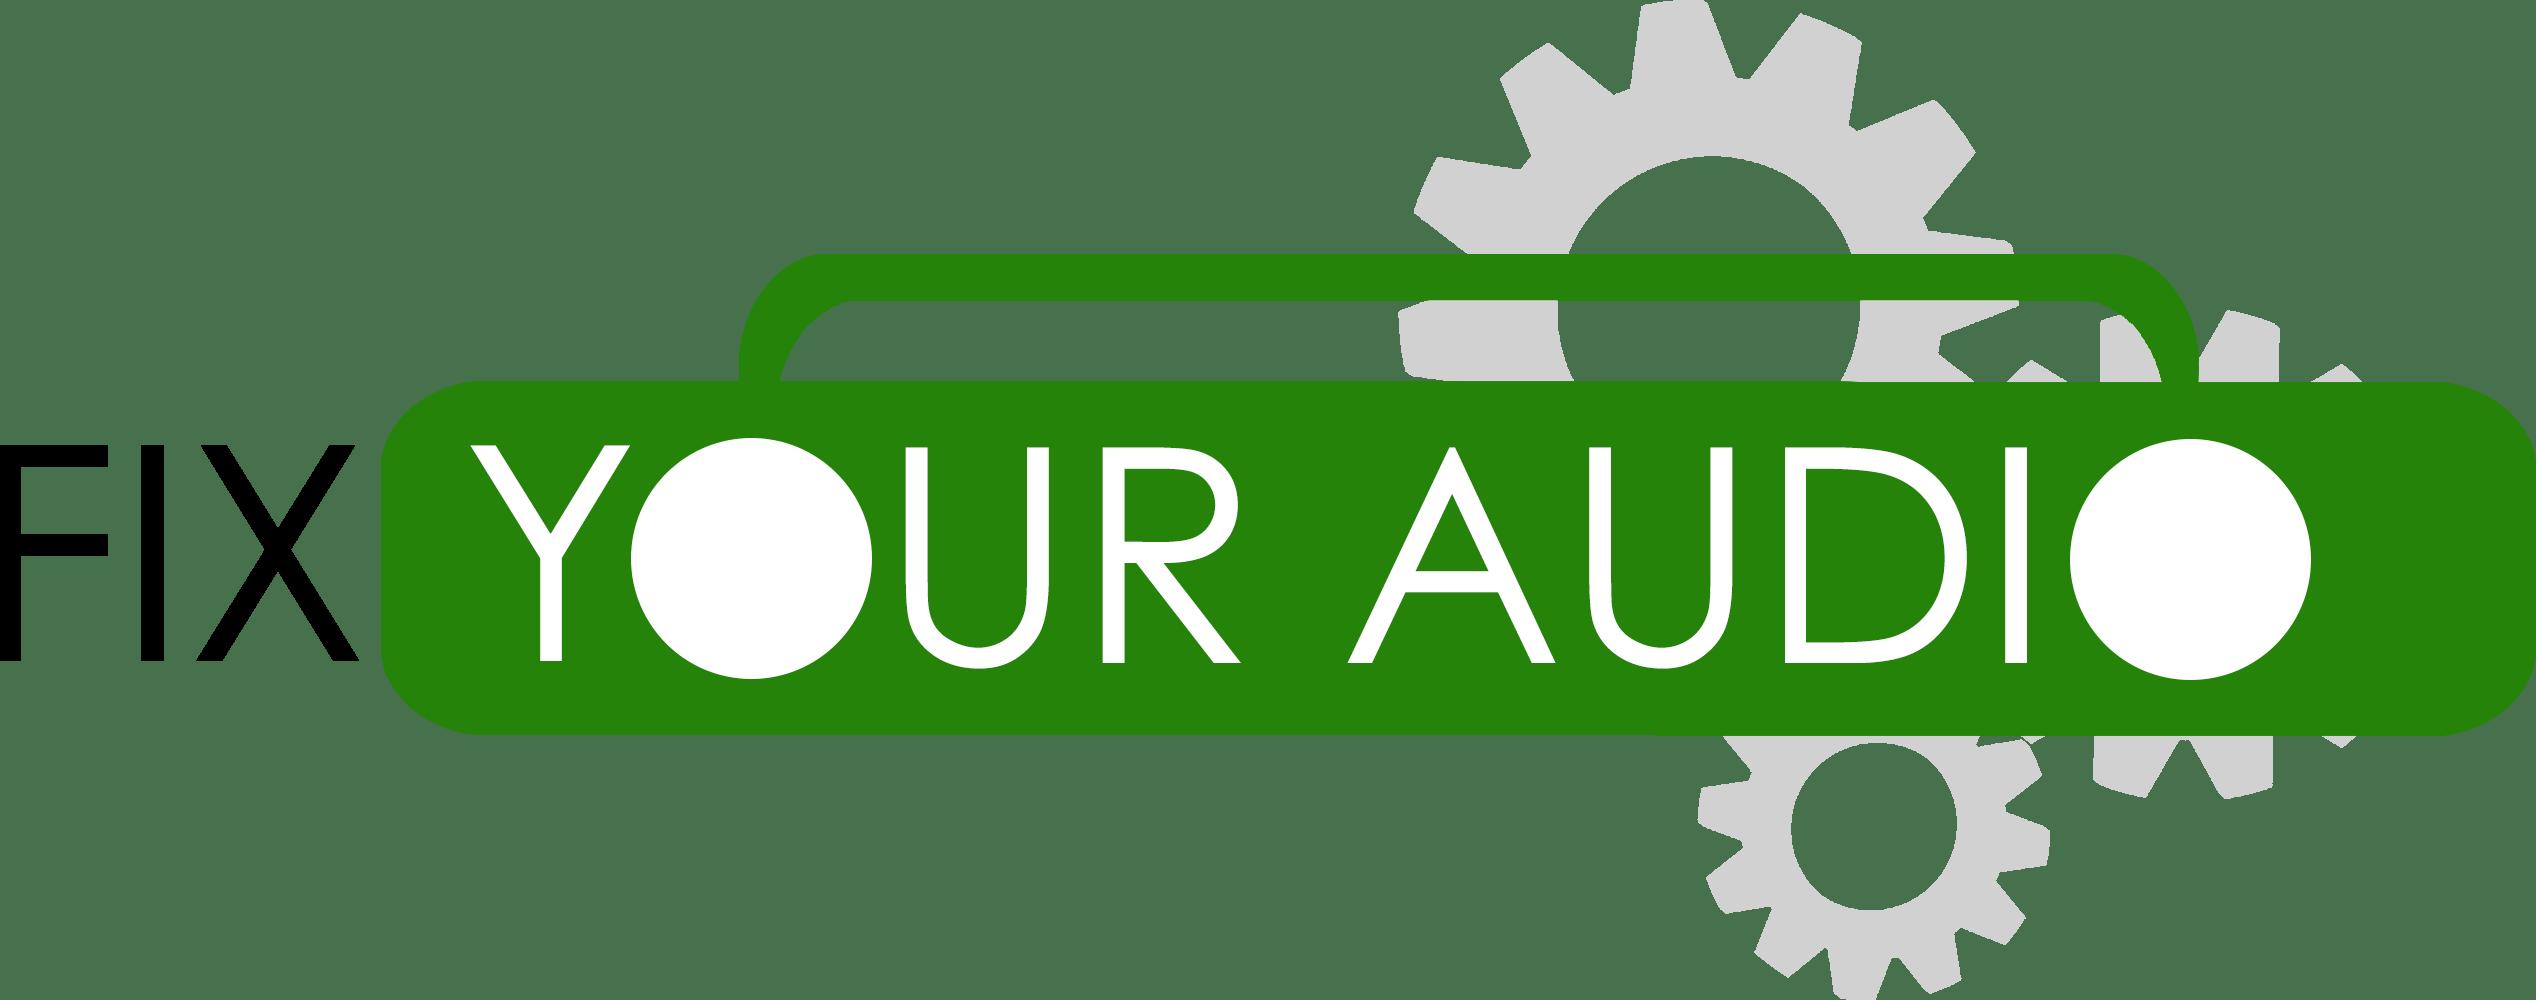 FixYourAudio